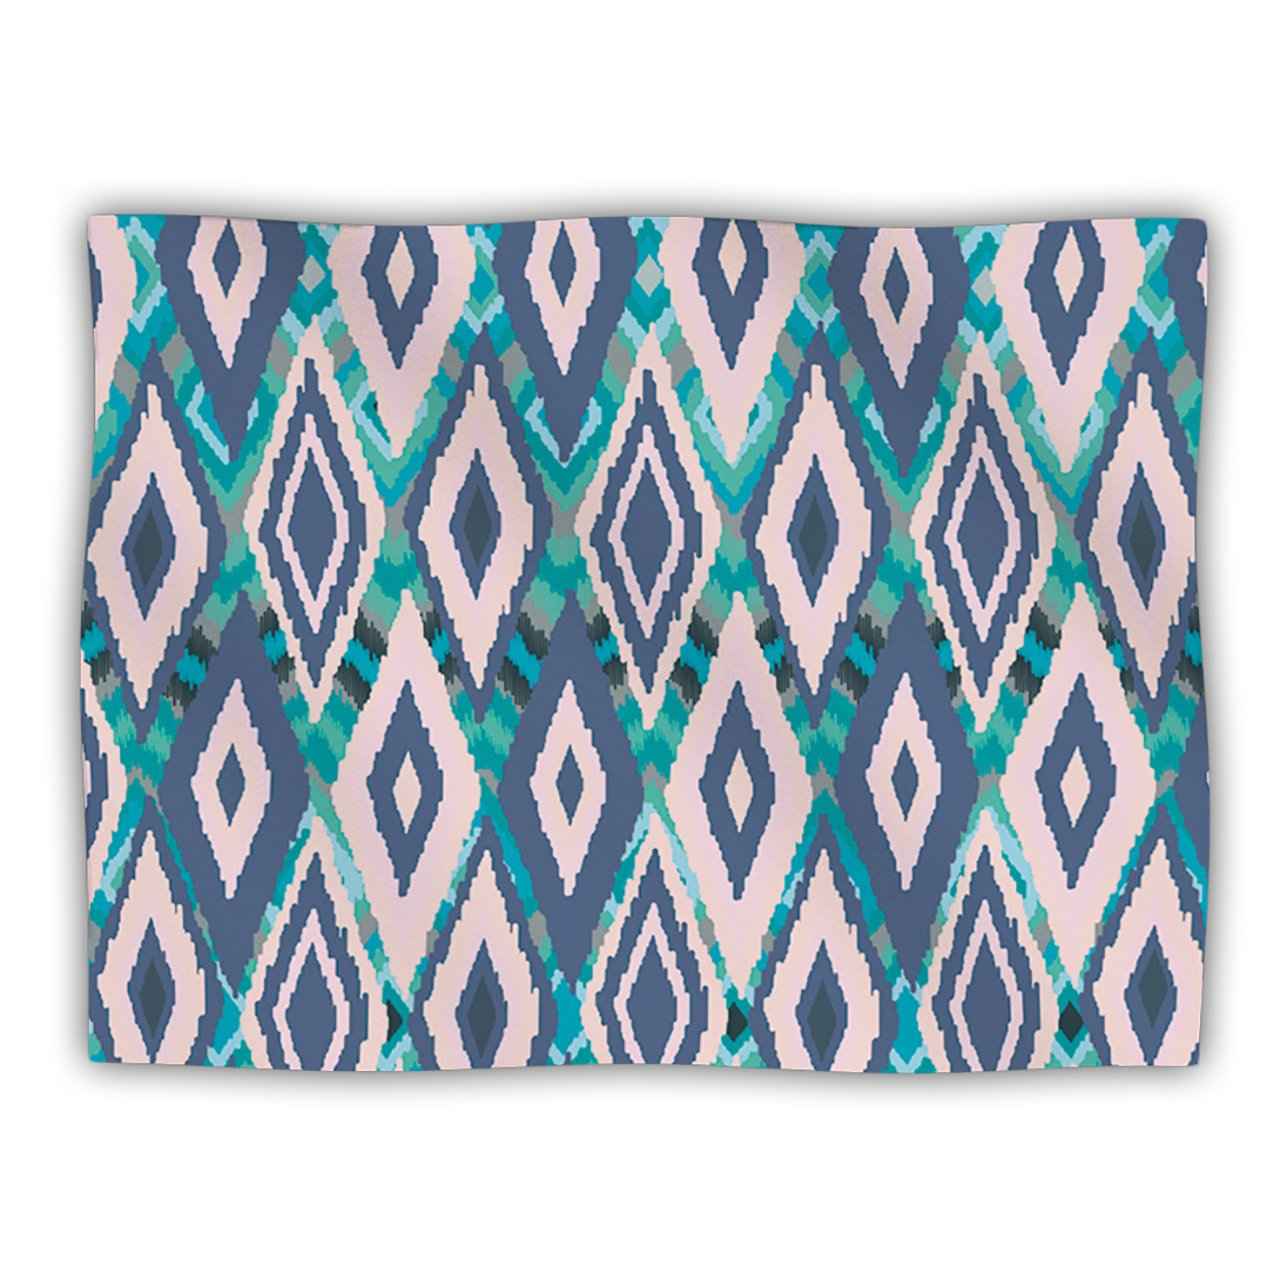 Kess InHouse Nika Martinez 'Tribal Ikat' Blue Pattern Dog Blanket, 40 by 30-Inch